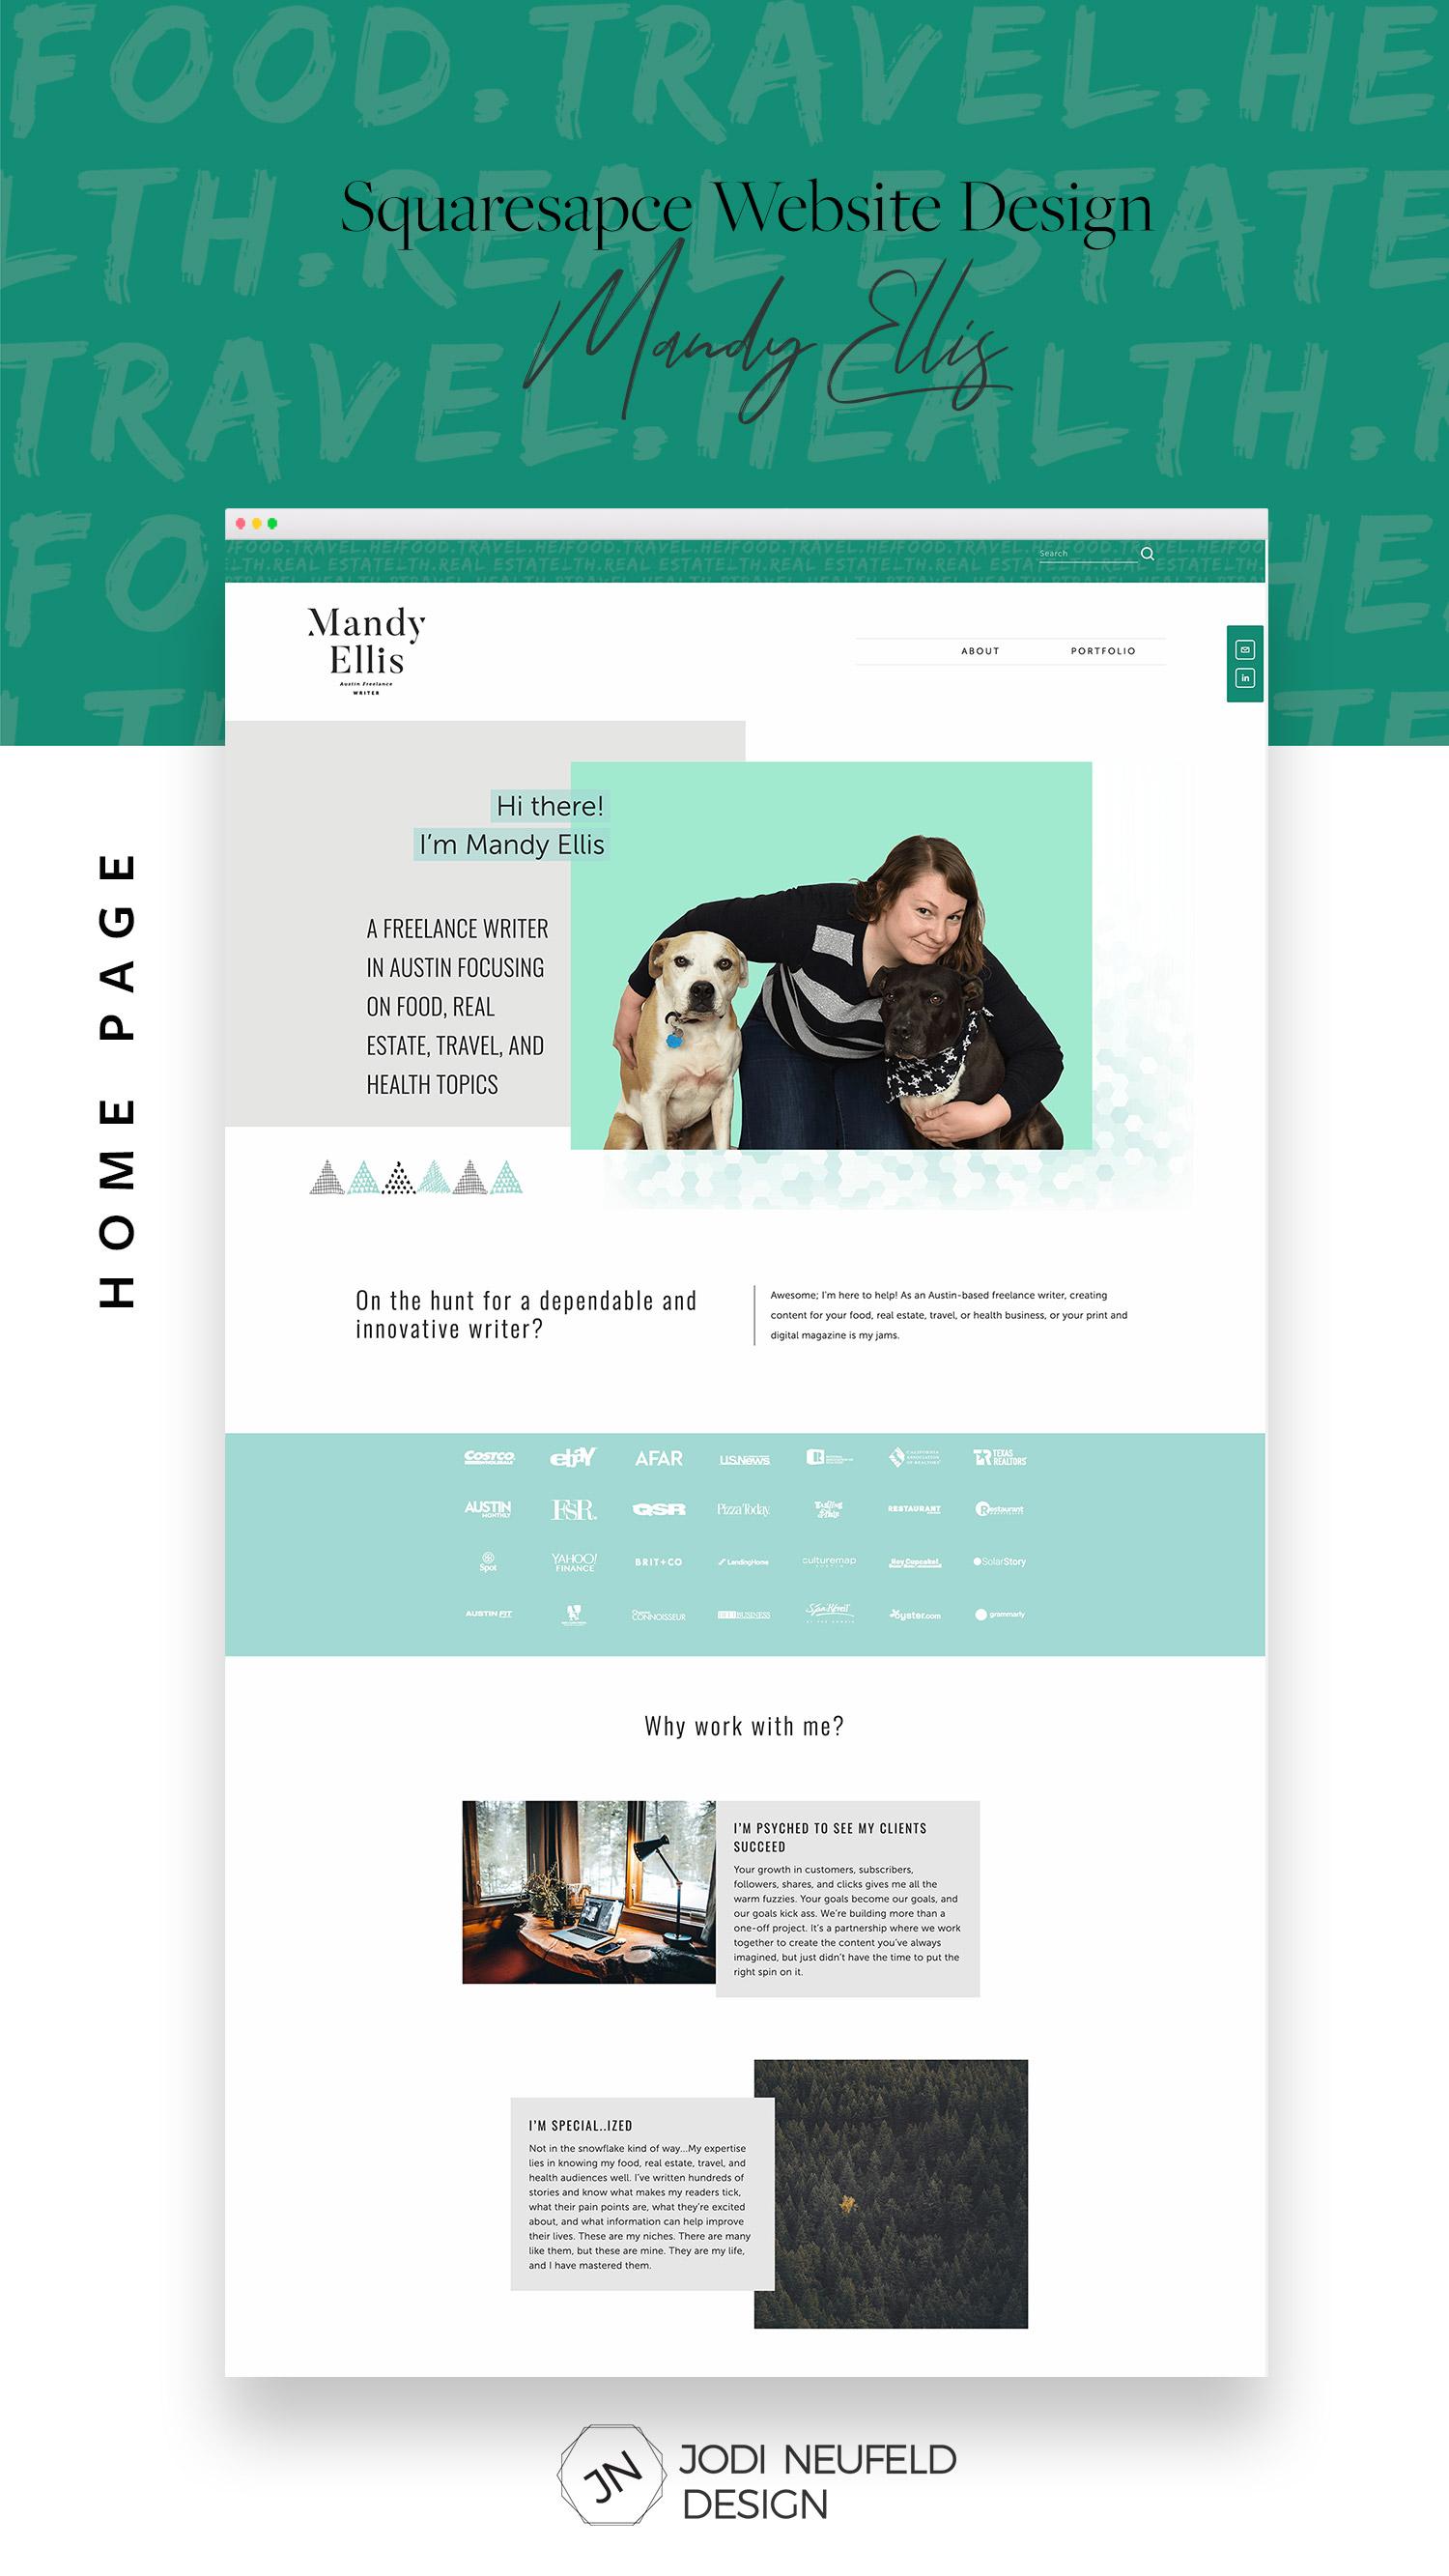 Mandy Ellis freelance writer | Home page | #squarespace web design by Jodi Neufeld Design